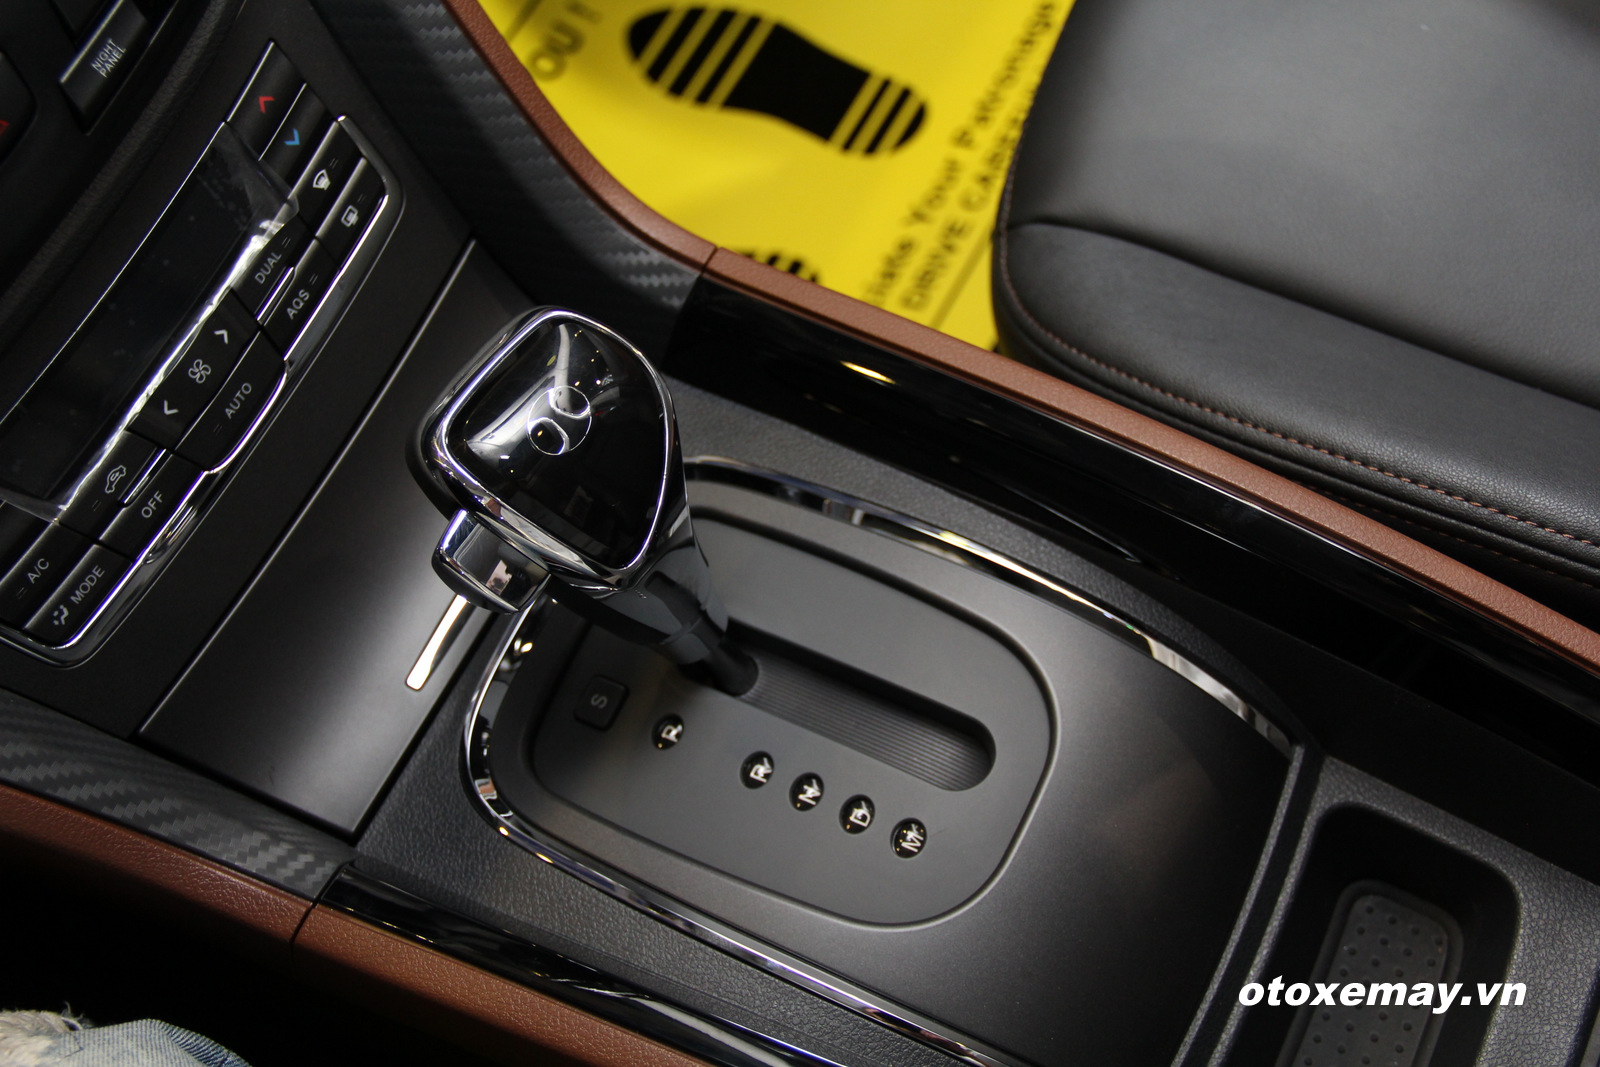 VIMS 2015: Cận cảnh sedan BAIC CC của Trung Quốc 11